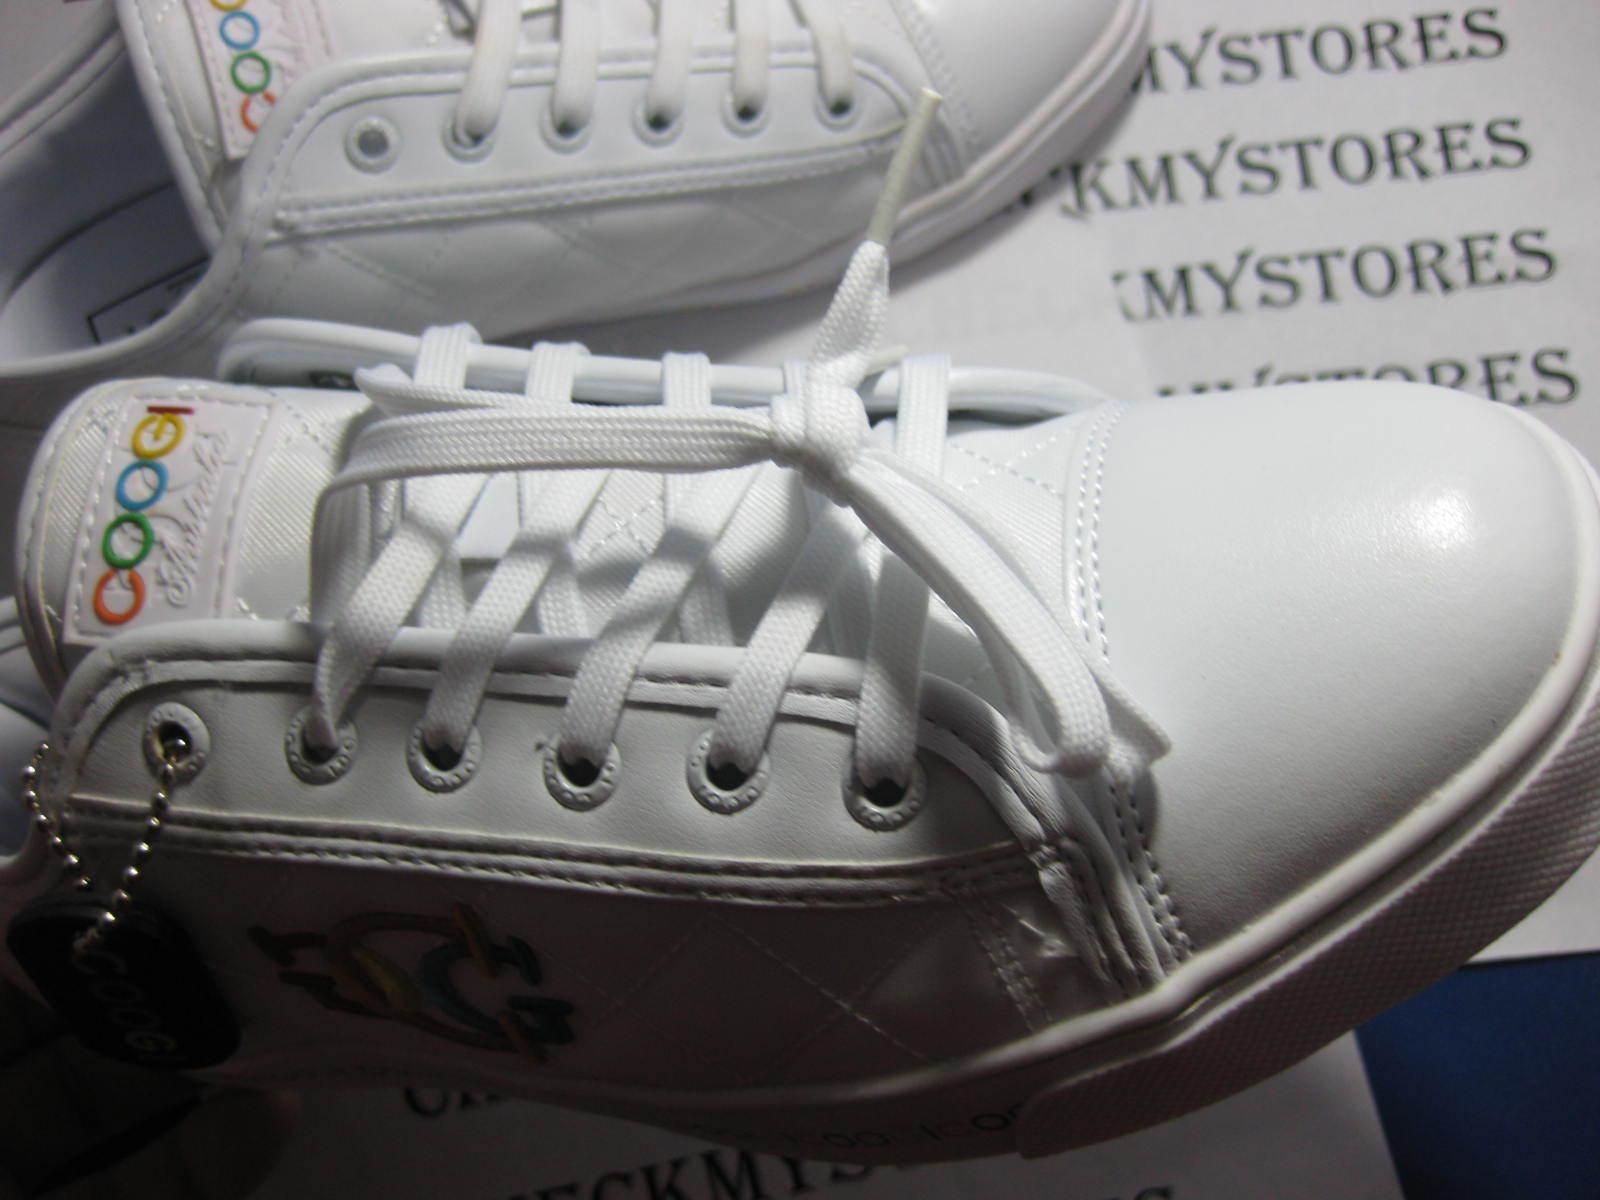 NIB NEW SZ COOGI AUSTRALIA FASHON/ATHLETIC STYLE DESIGNER Schuhe SZ NEW 6 6.5 7 7.5 8 9. b5317e